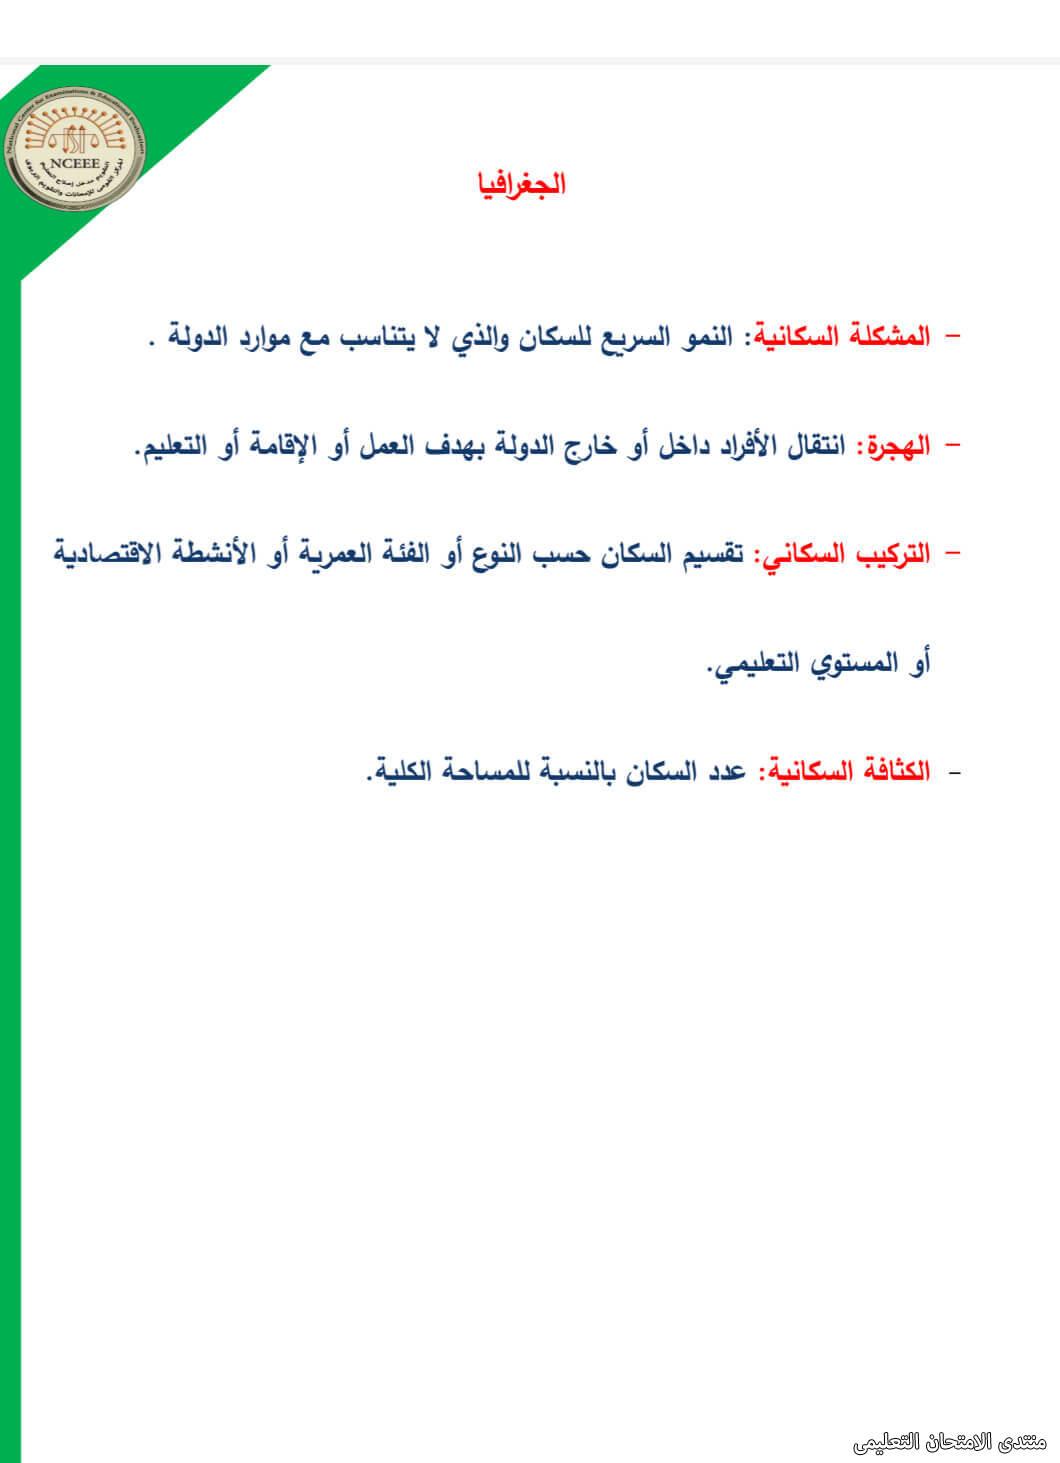 exam-eg.com_1619306733341210.jpg